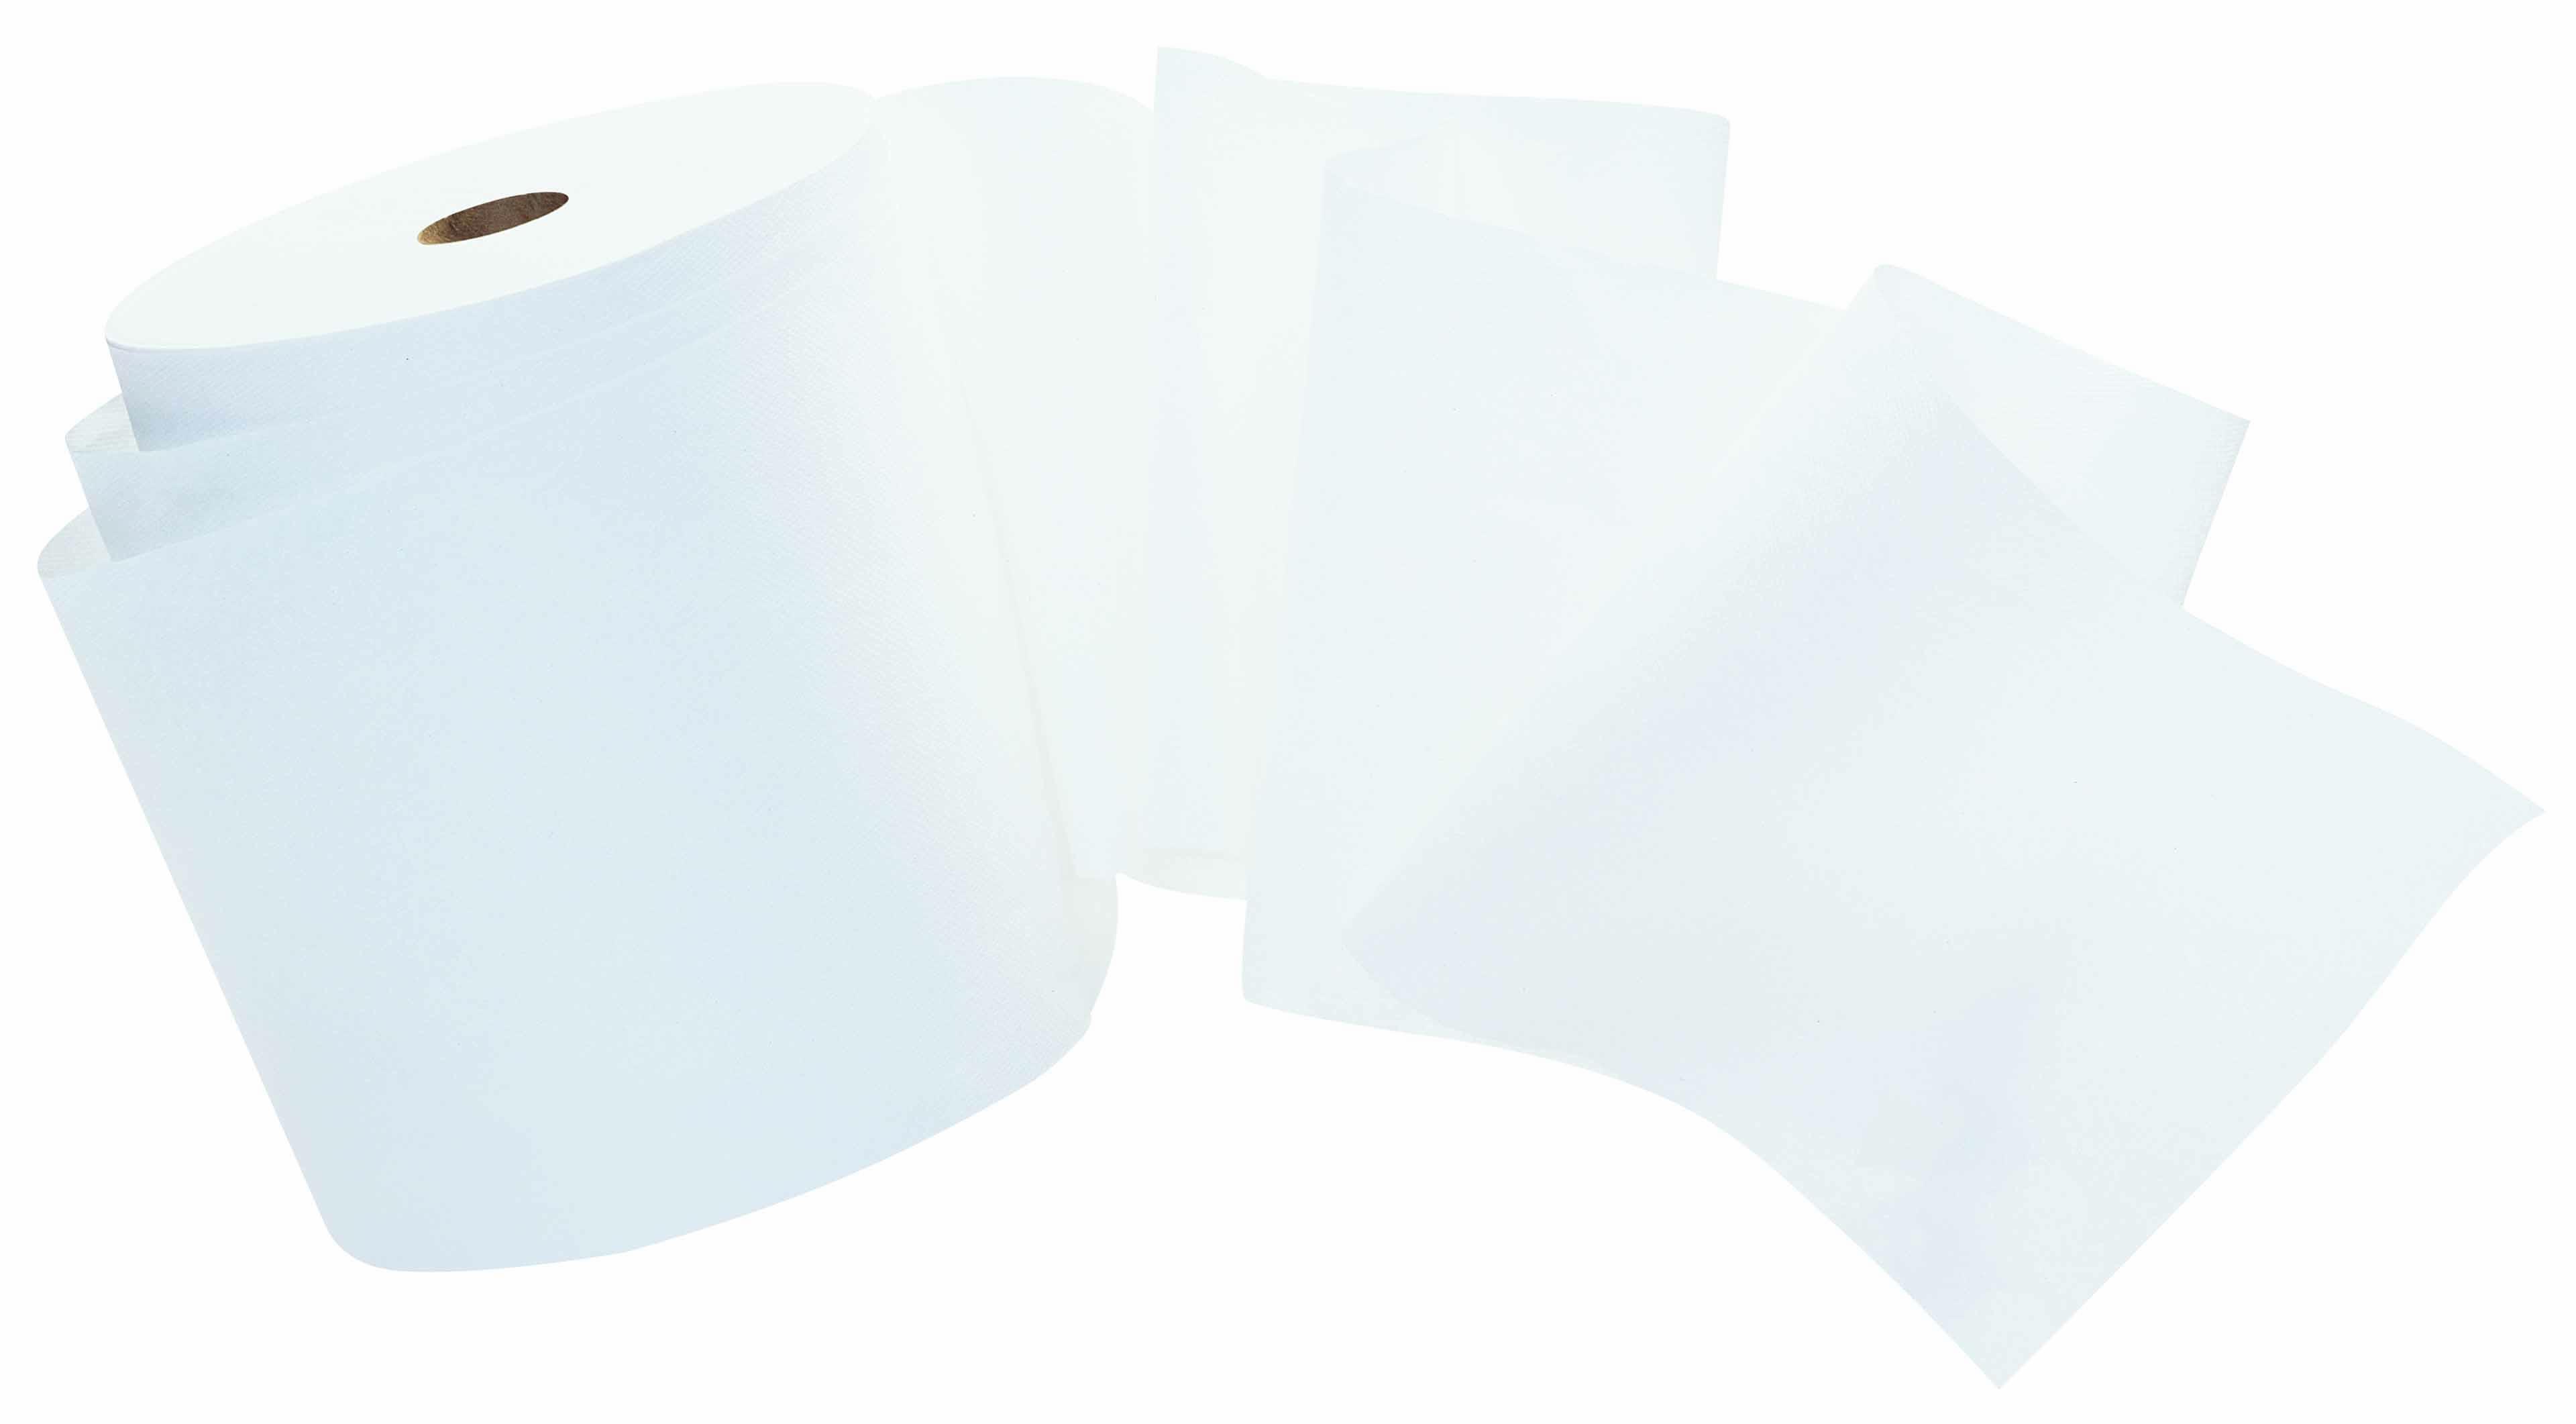 Scott Paper Towel Hardwound Roll 8 Inch X 1000 Foot, 01000 - Case of 12